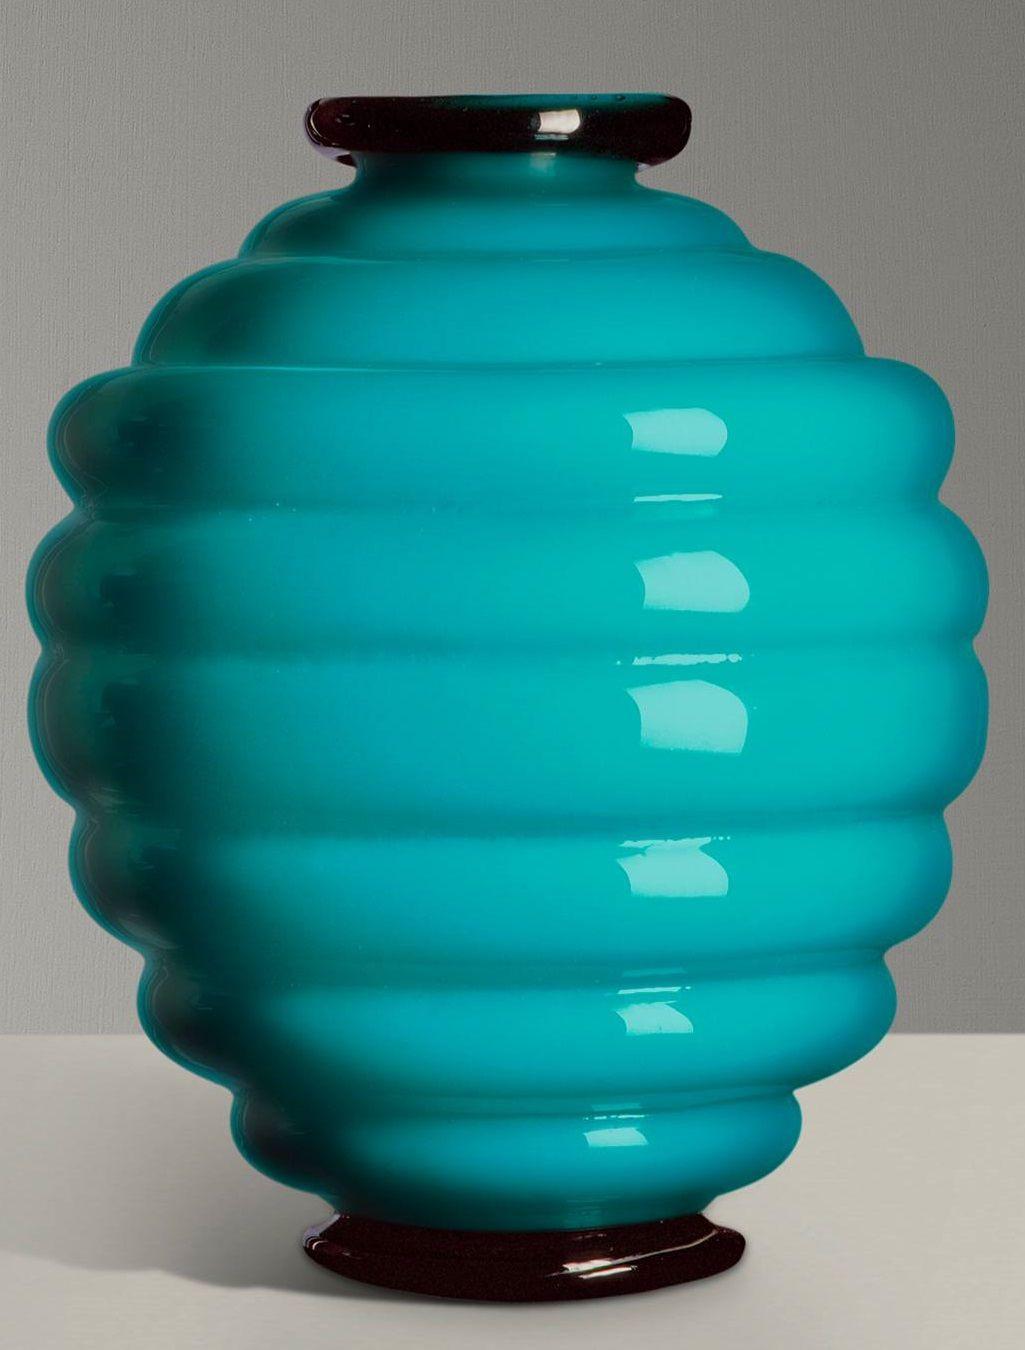 venini art glass vase of 1930 venini glass vase by napoleone martinuzzi murano glass throughout 1930 venini glass vase by napoleone martinuzzi